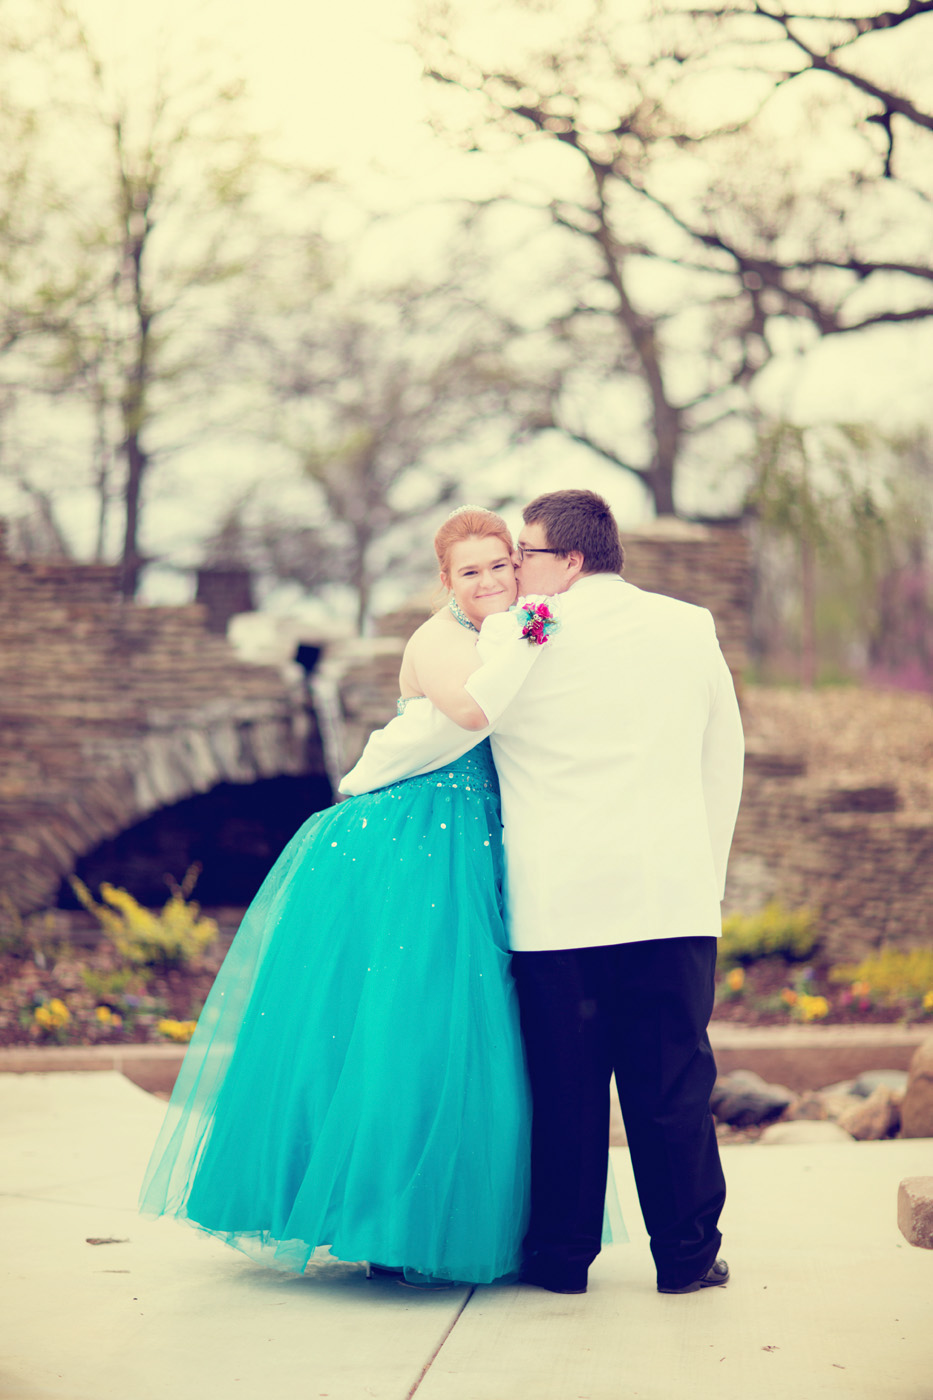 Garrett & Helen Prom 2014 246_1.jpg